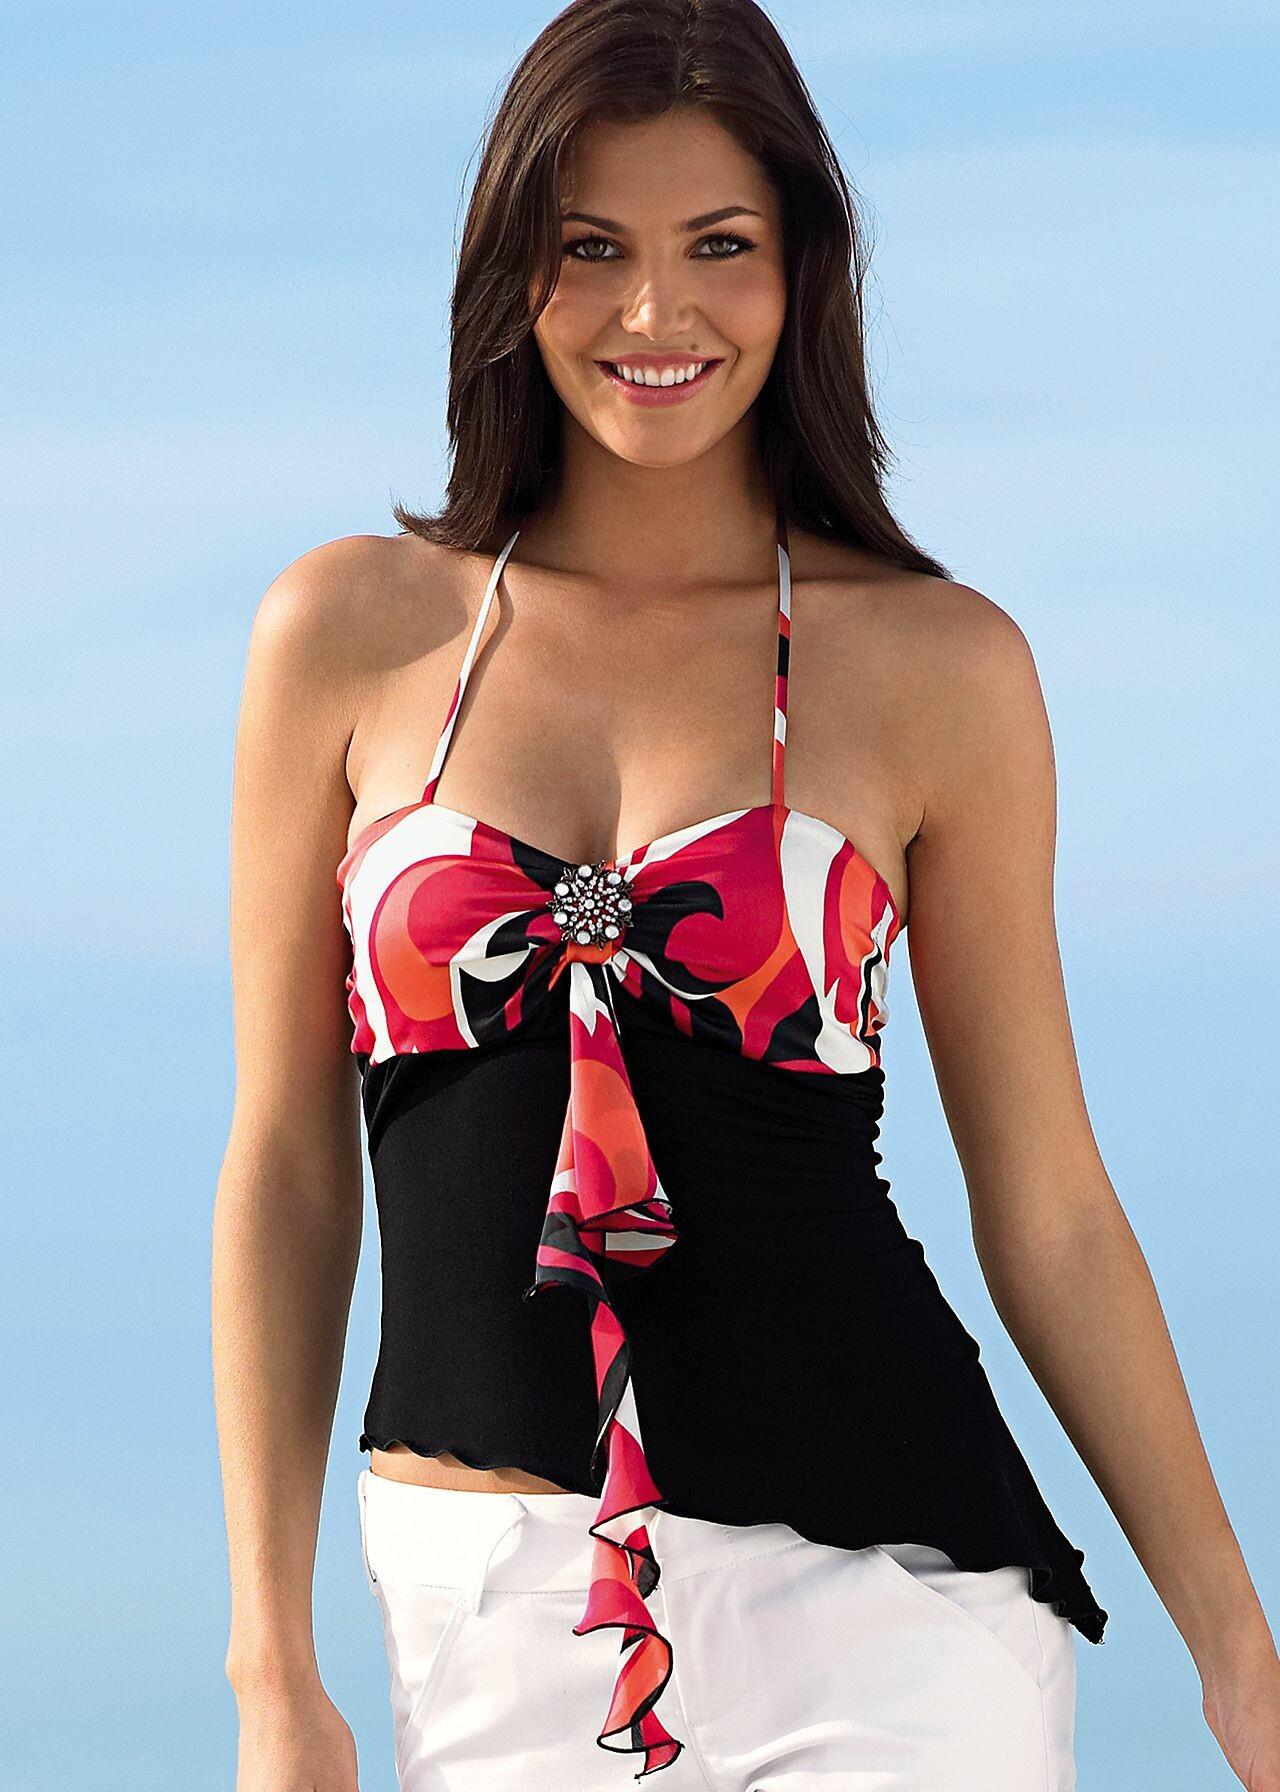 be741da262 Former (and Unidentified) Venus Swimwear Models - Model ID - Bellazon